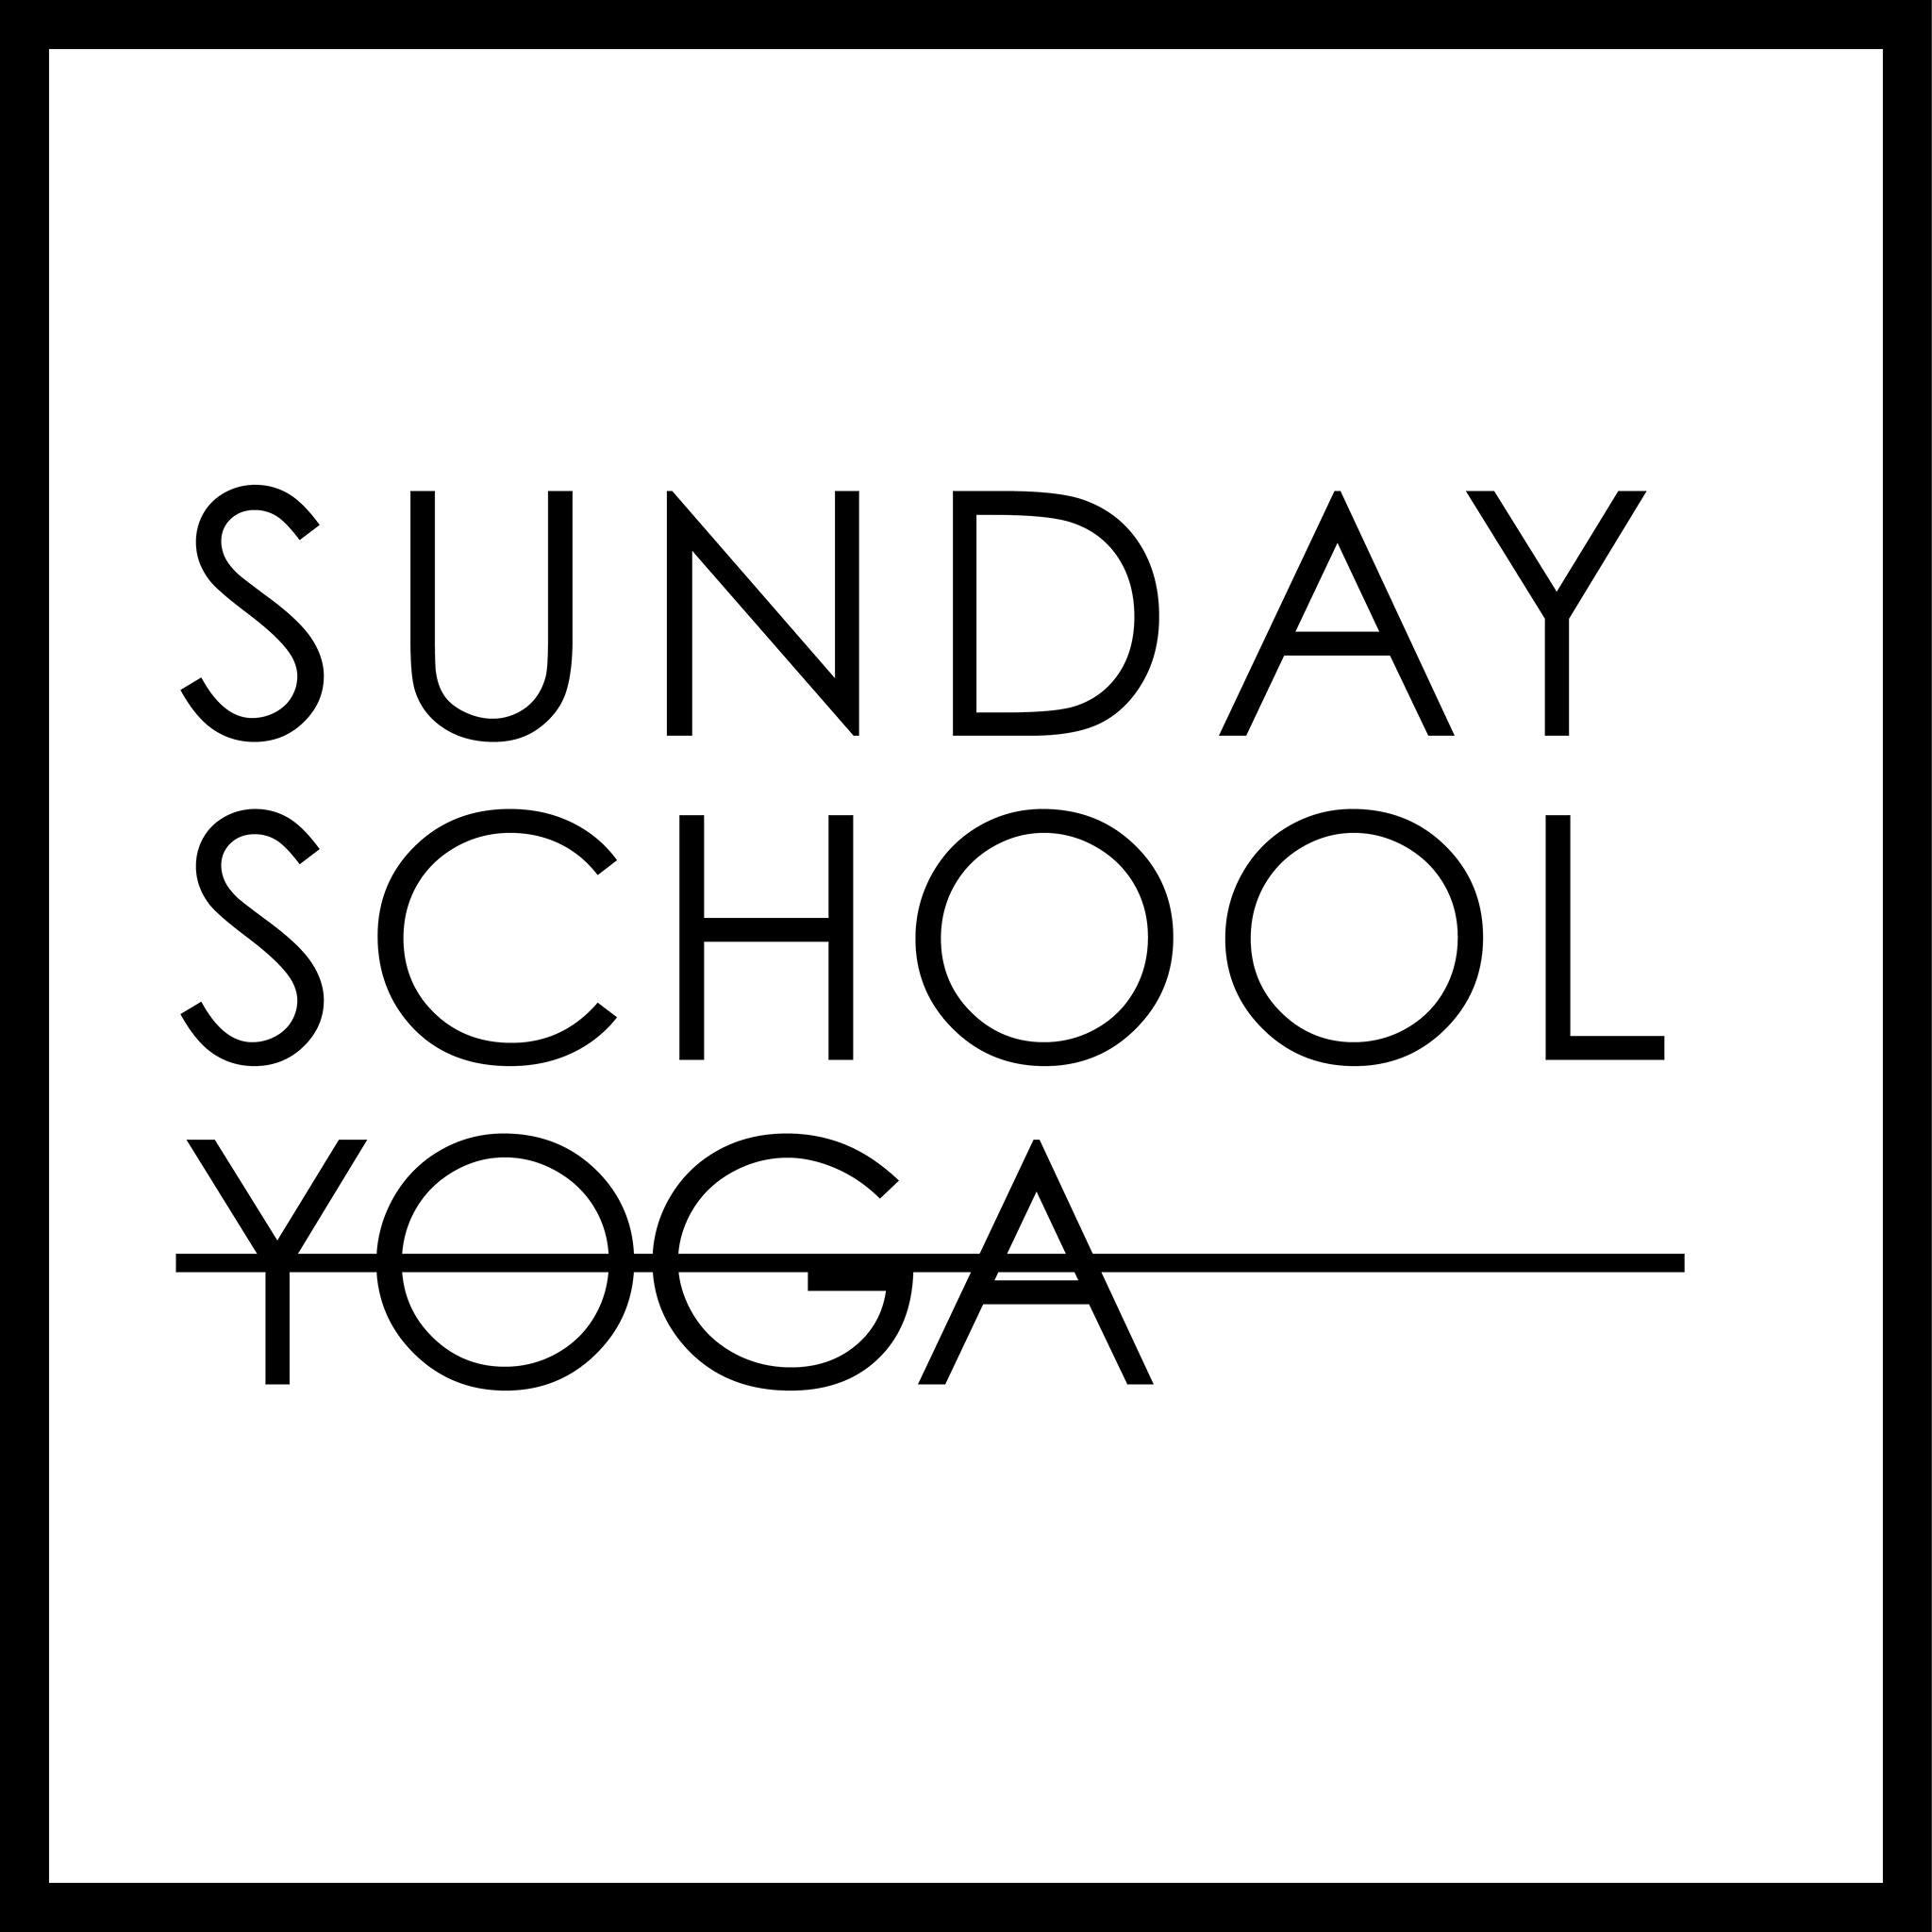 Sunday School Yoga